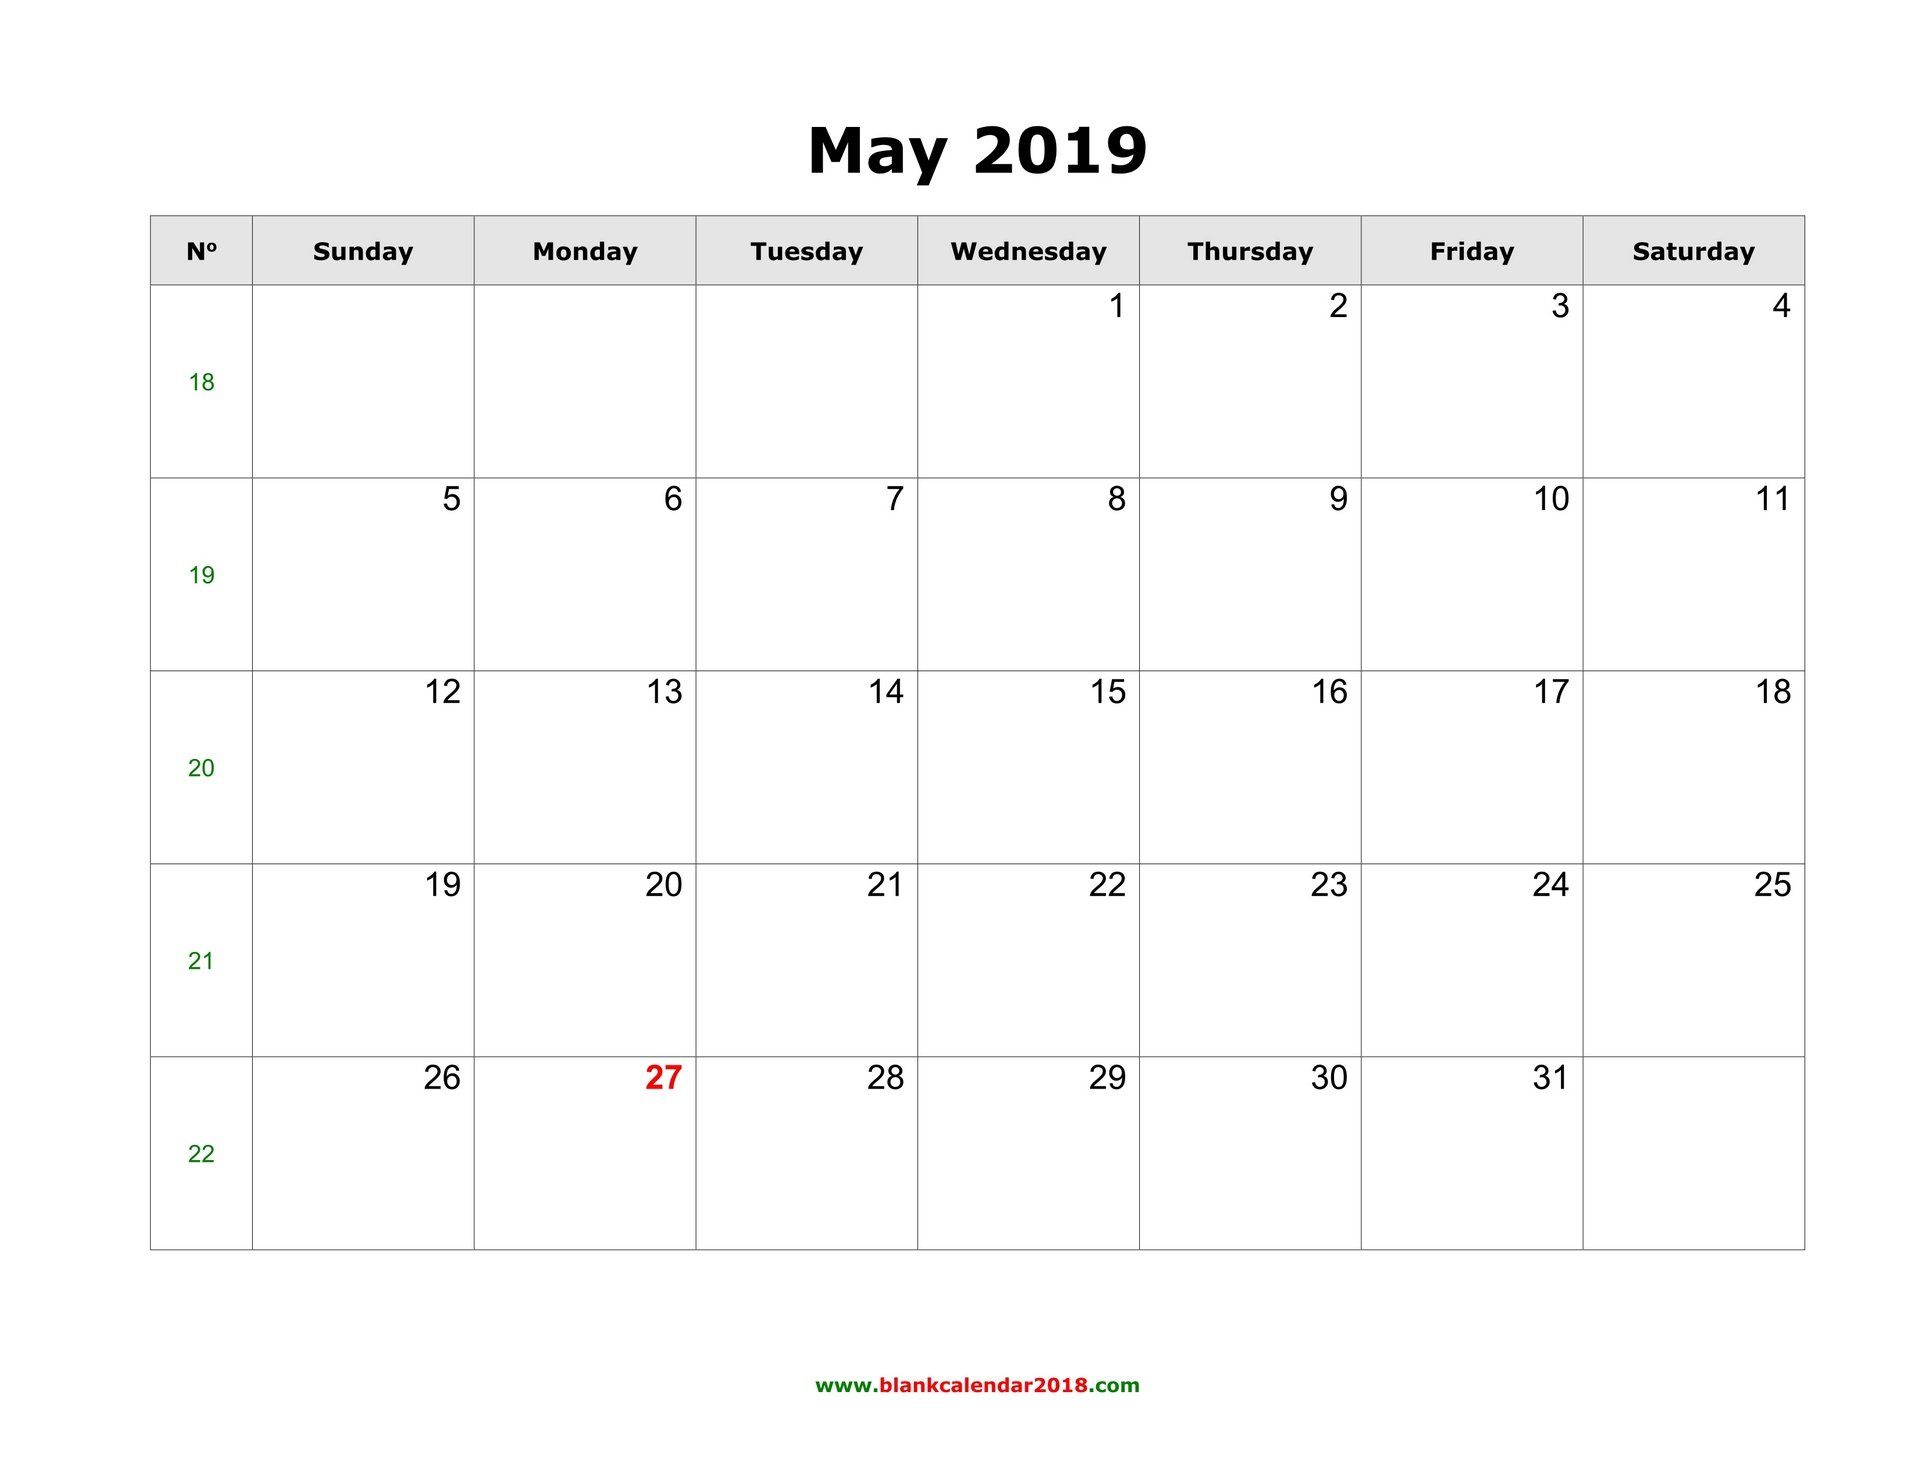 Blank Calendar For May 2019 Calendar 2019 Microsoft Word